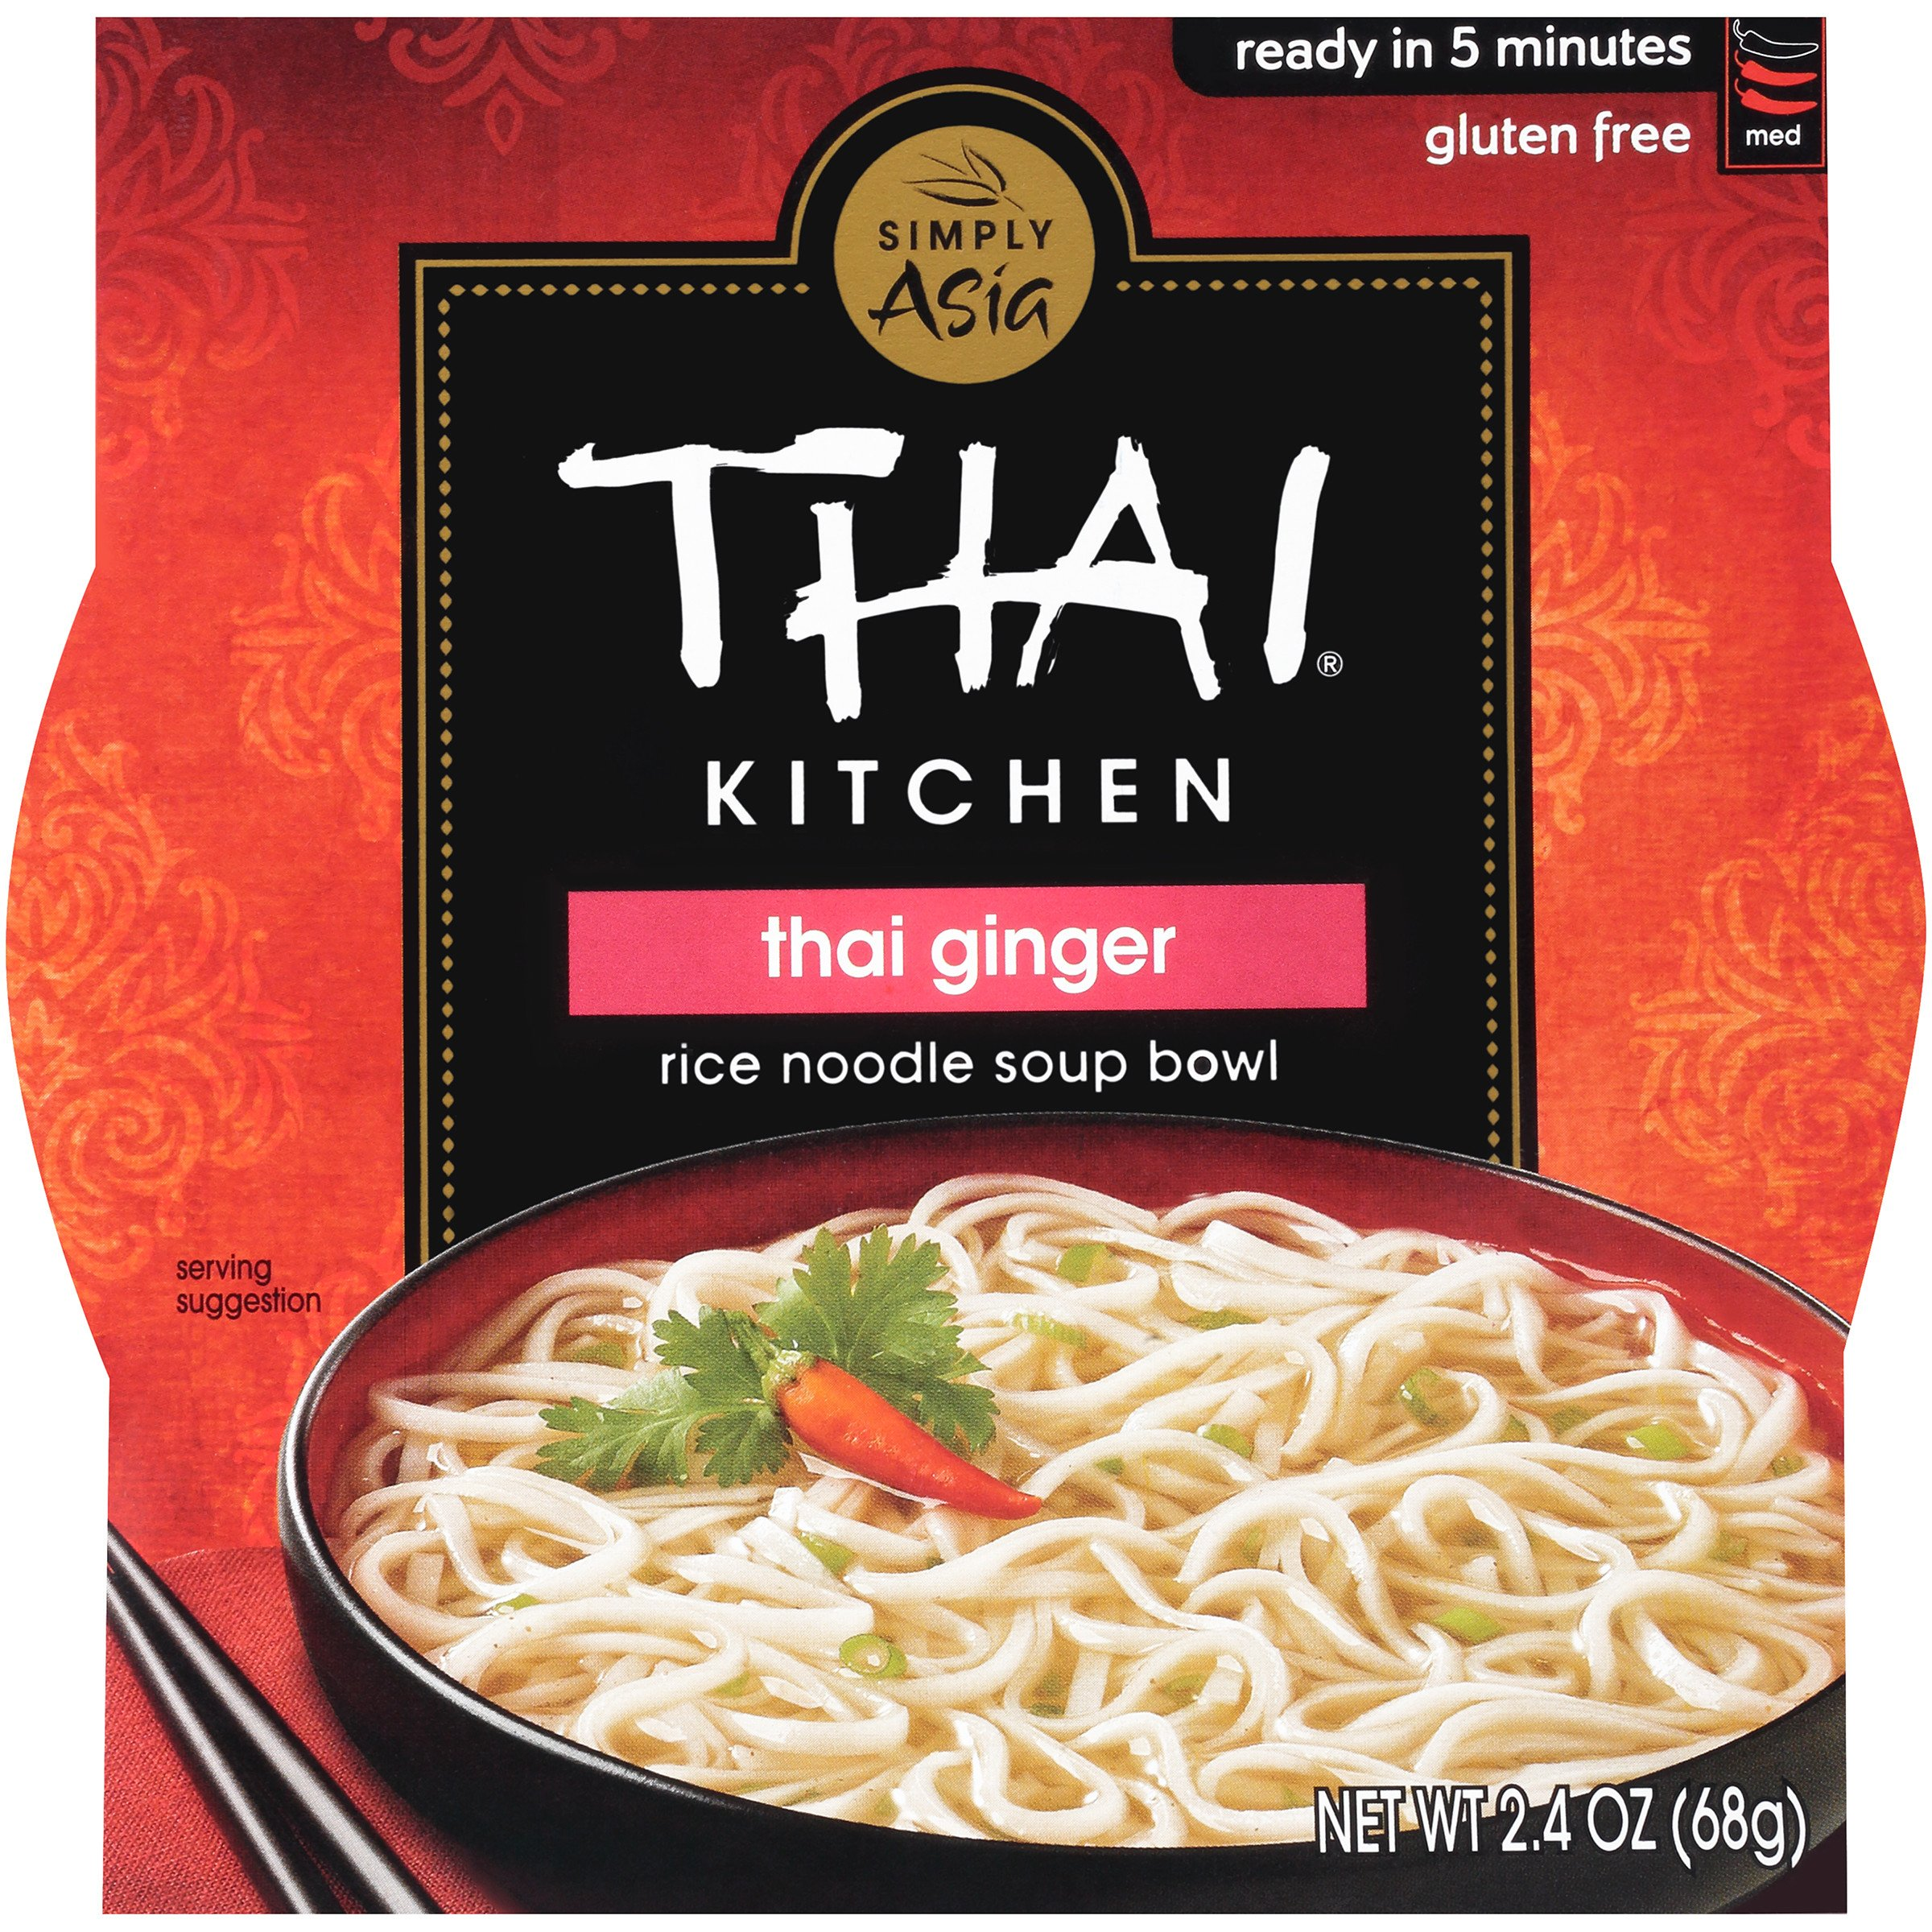 Thai Kitchen Gluten Free Thai Ginger Rice Noodle Soup Bowl 2 4 Oz Case Of 36